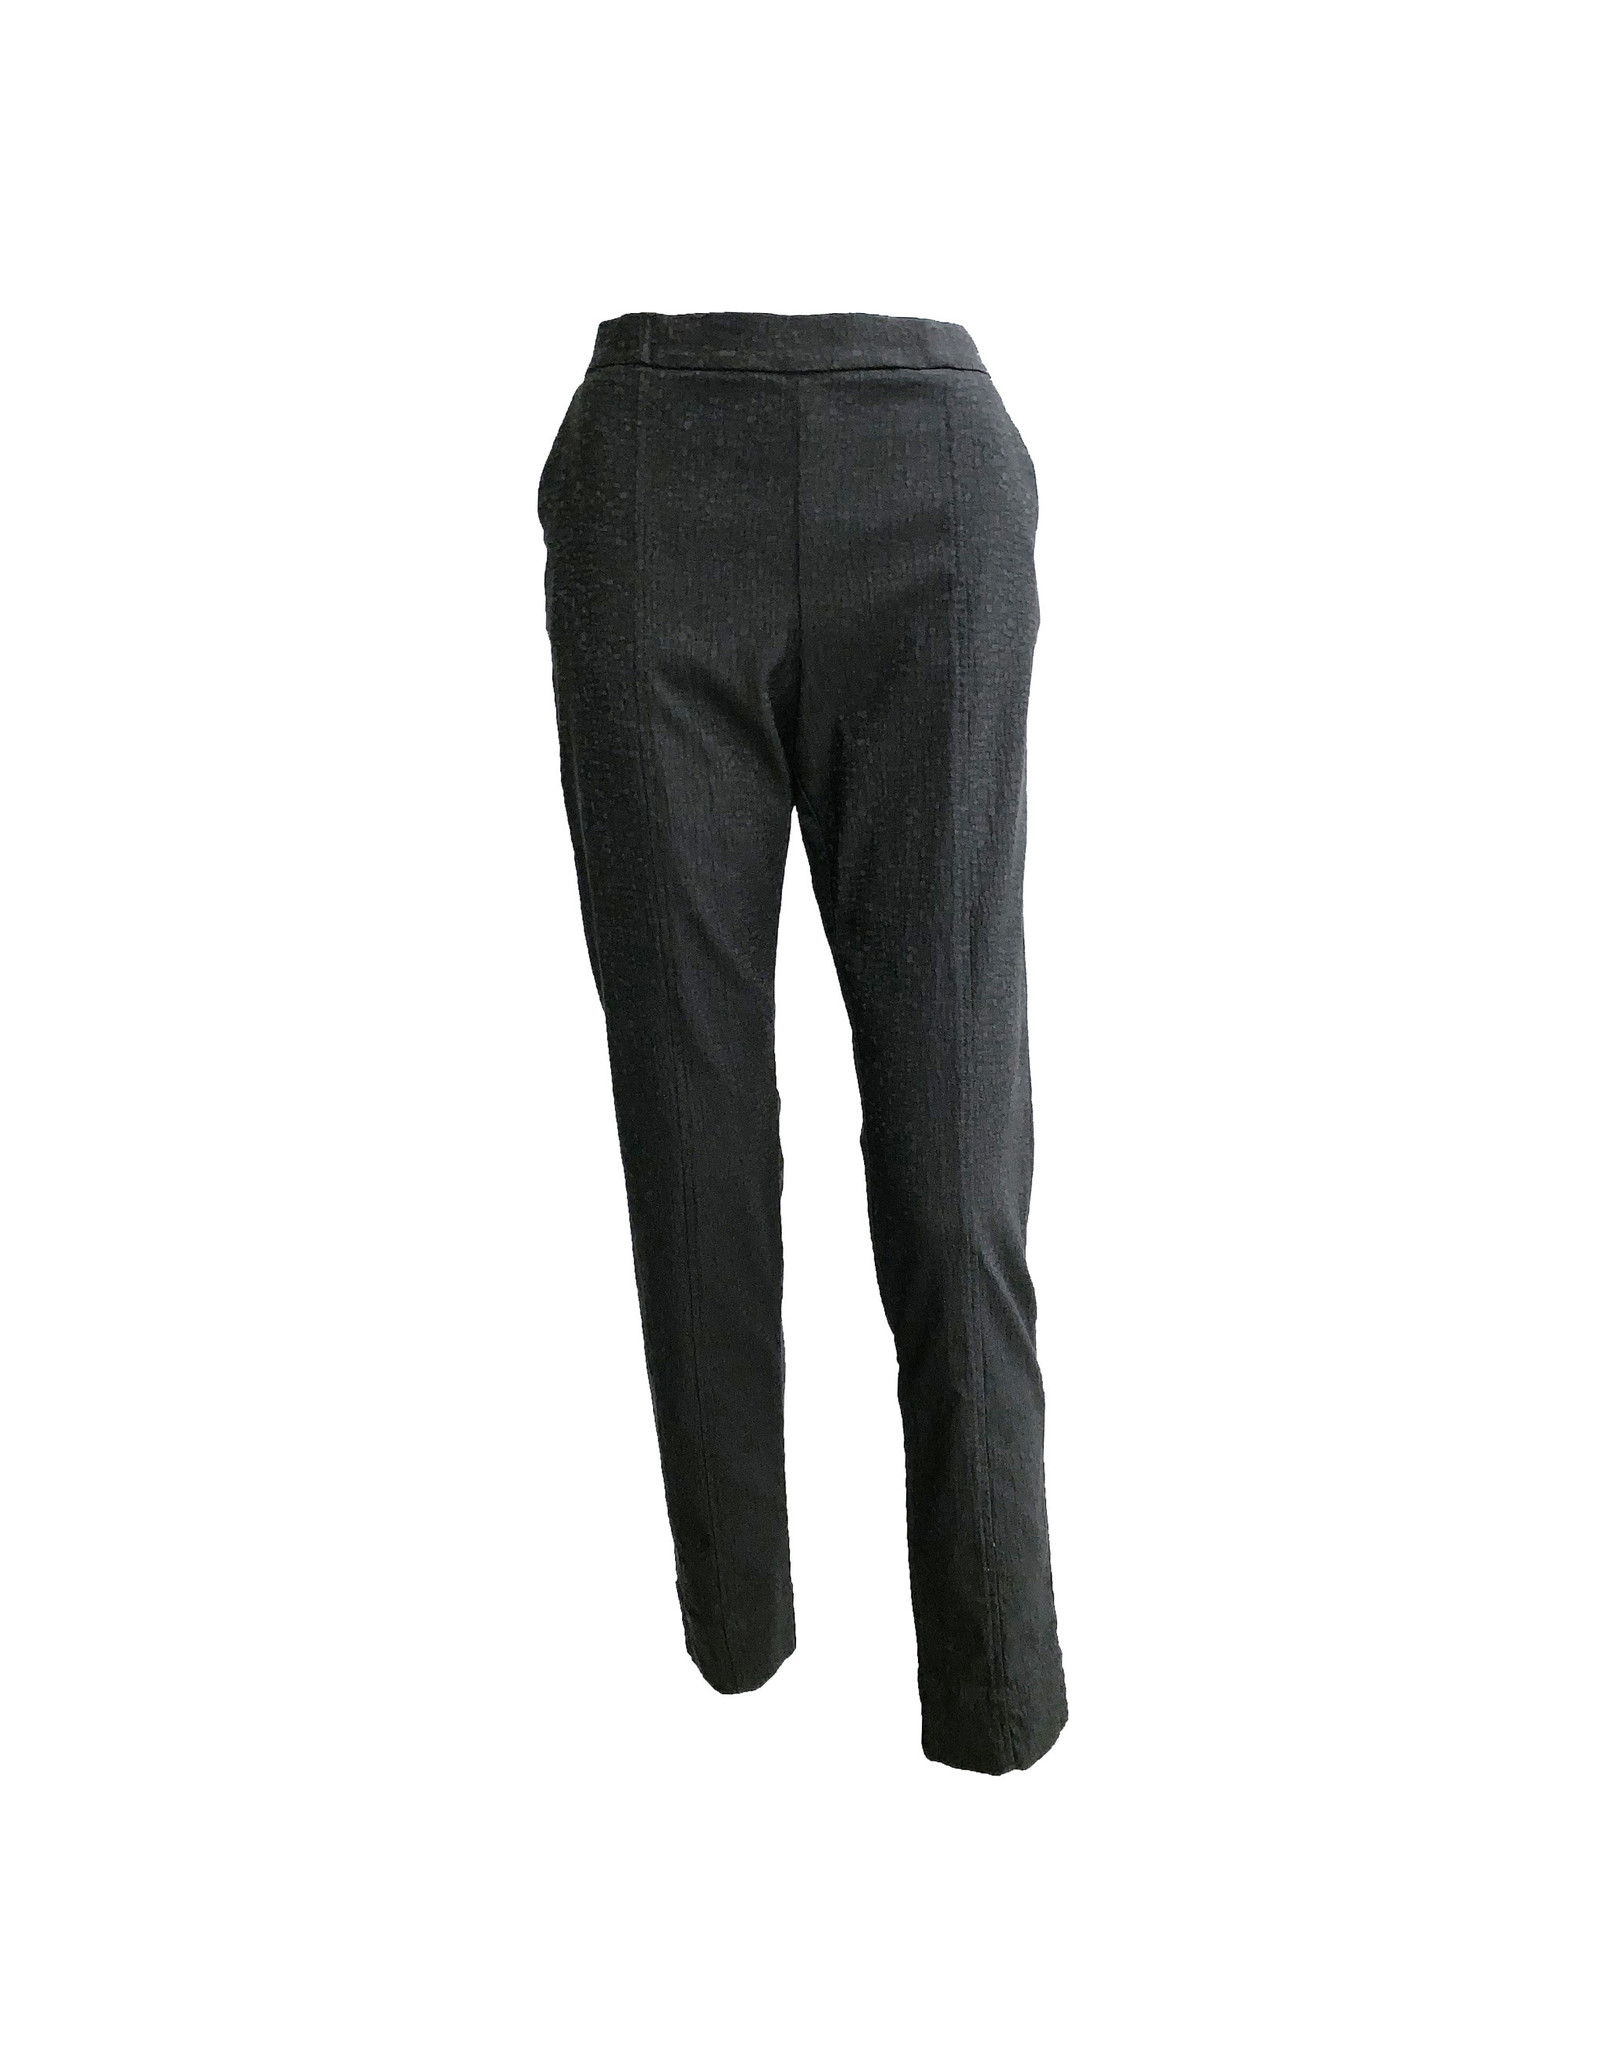 Alembika Alembika Straight Leg Pull Pants - Black